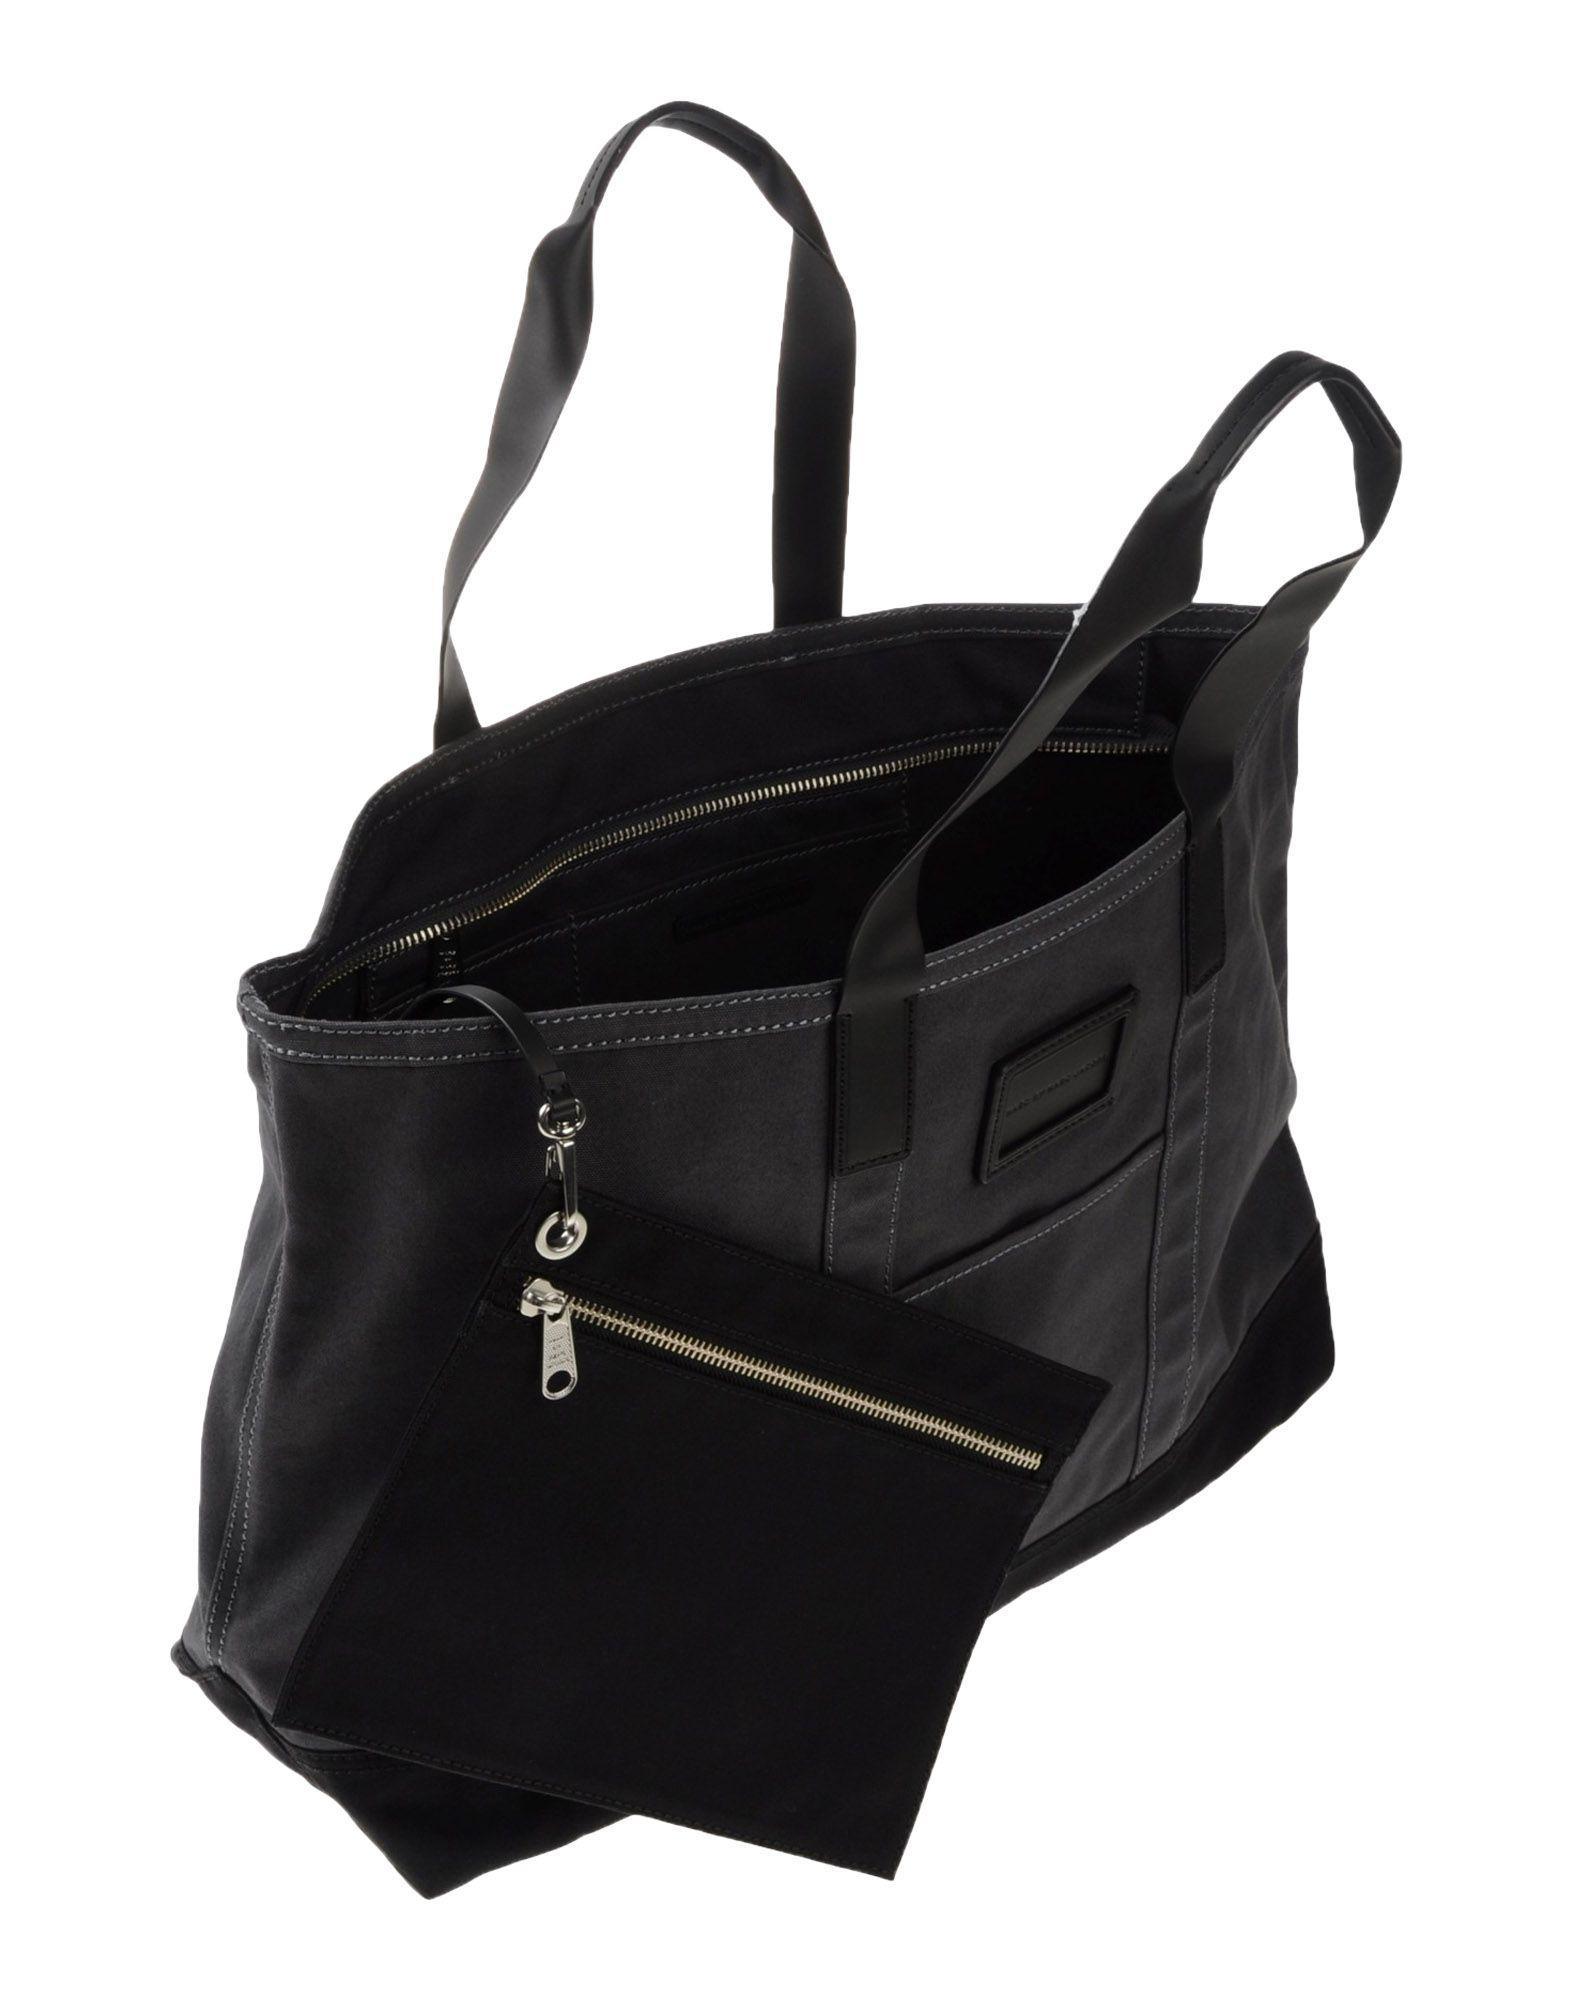 Marc By Marc Jacobs Handbag In Black For Men Lyst